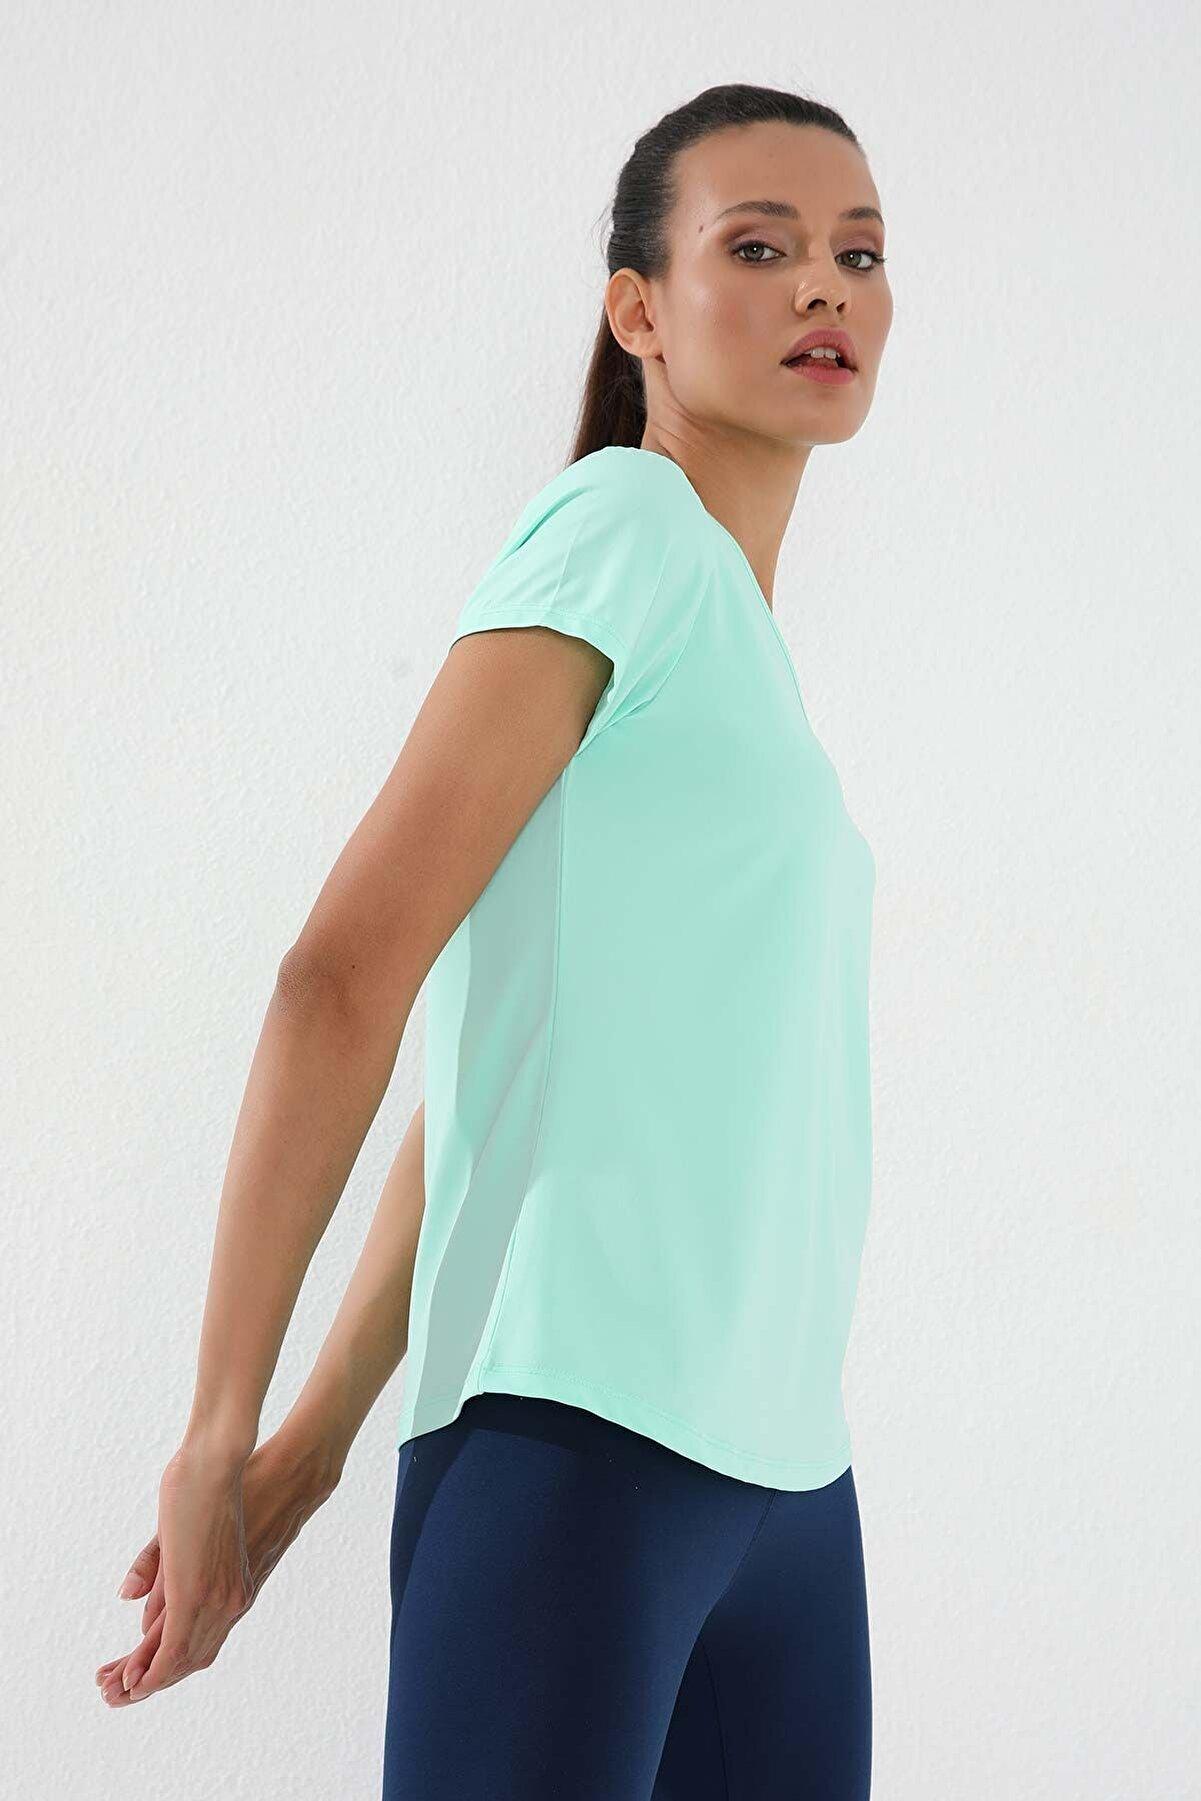 Tommy Life Mint Yeşili Kadın Basic Kısa Kol Standart Kalıp V Yaka T-shirt - 97145